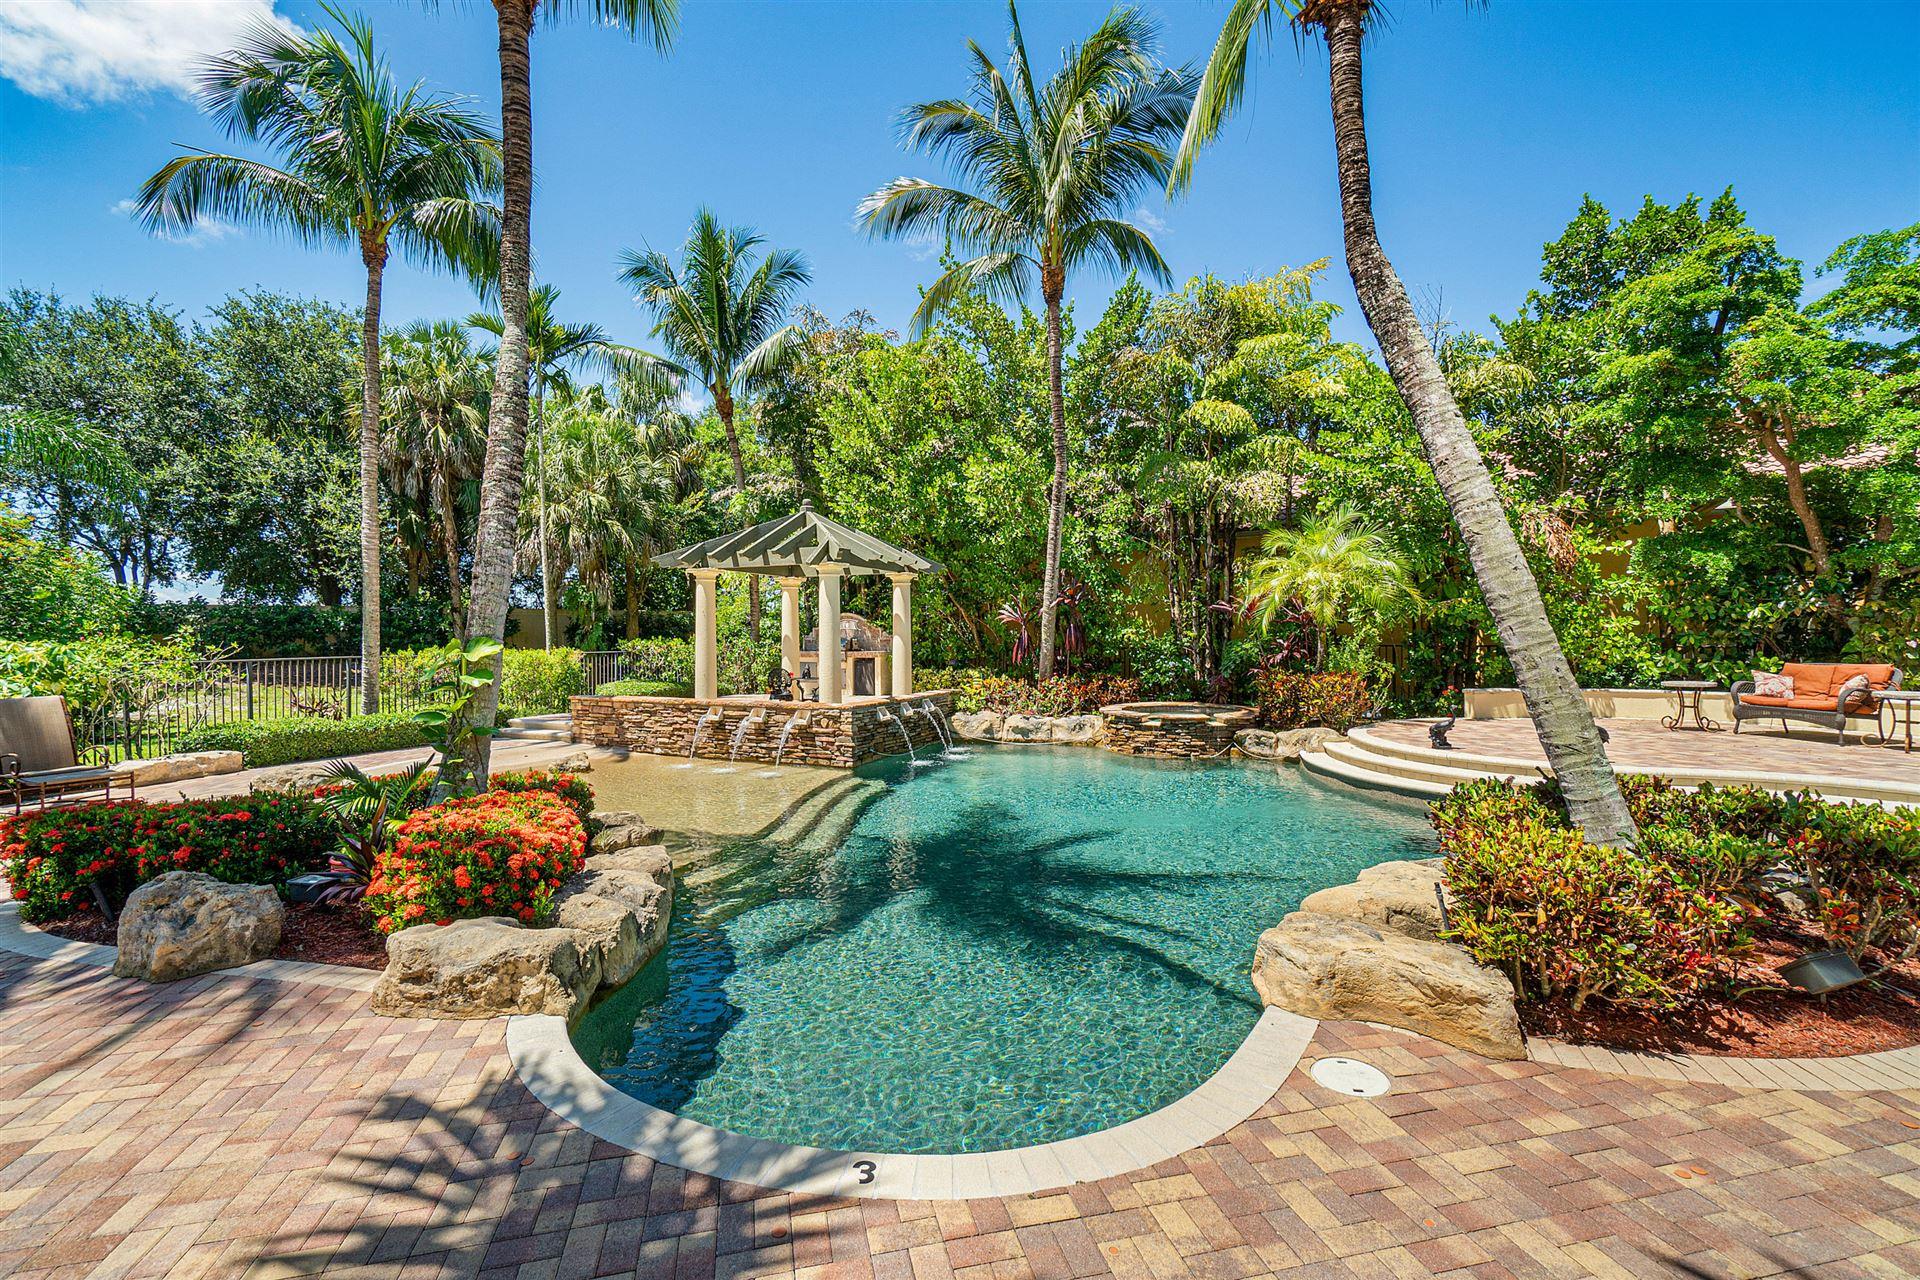 17881 Villa Club Way, Boca Raton, FL 33496 - #: RX-10549261